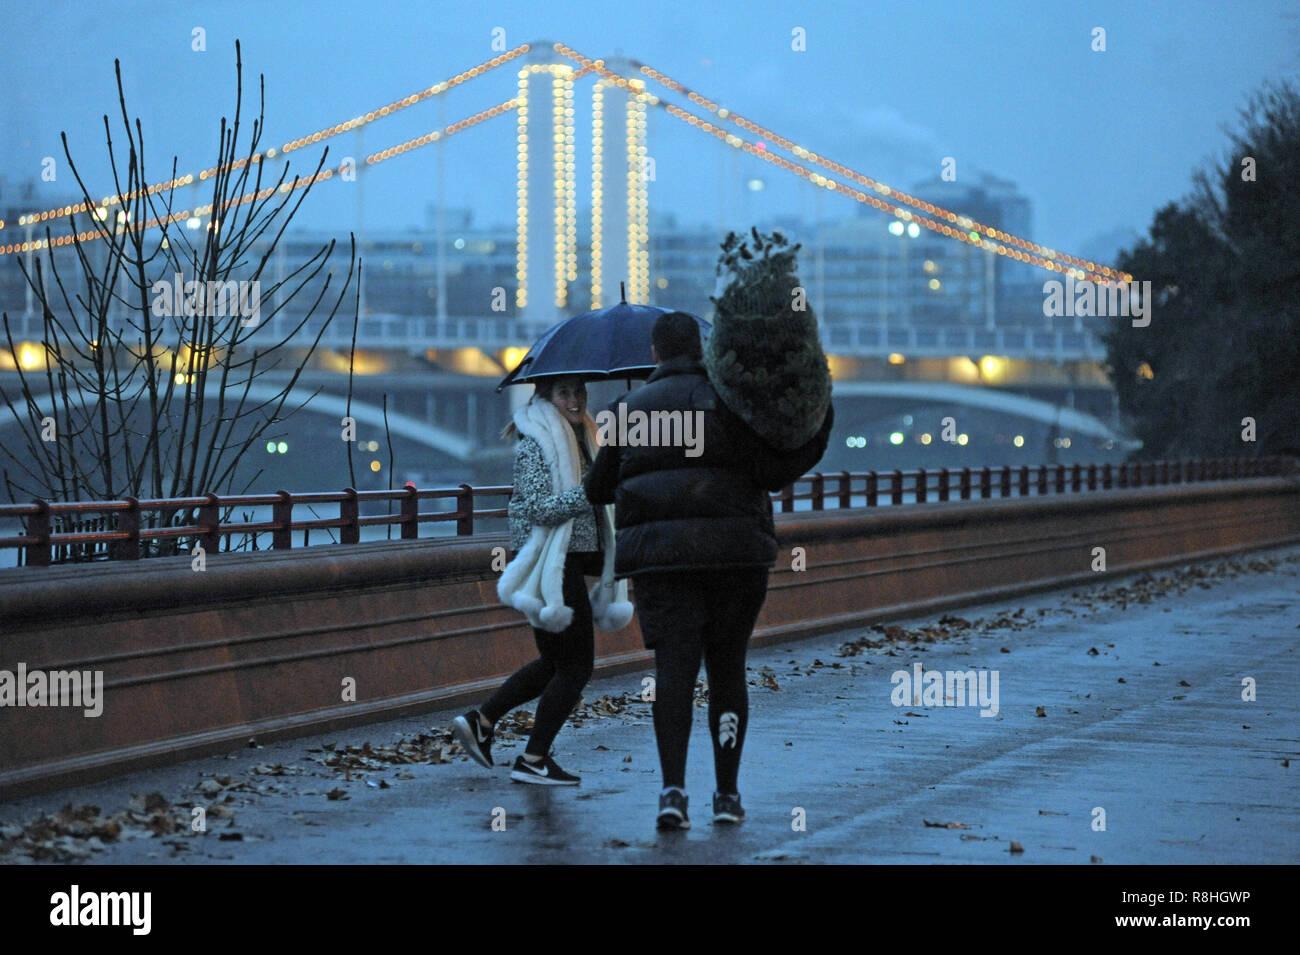 Umbrella Christmas Tree Uk.London Uk 15th December 2018 Albert A Couple With